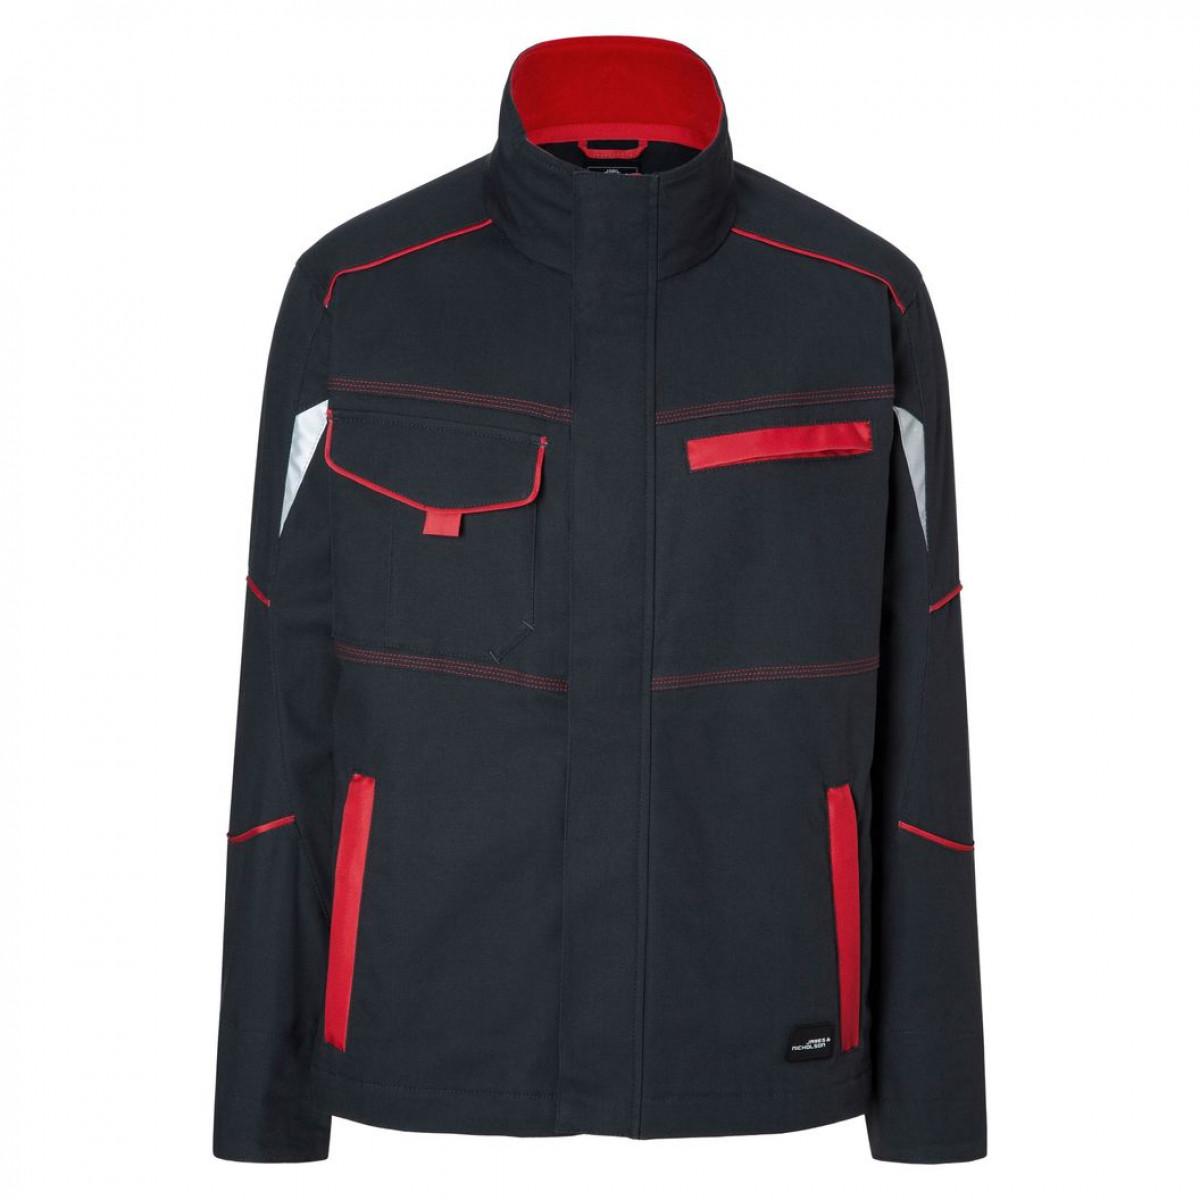 Куртка мужская JN849 Workwear Jacket - Темно-серый/Красный